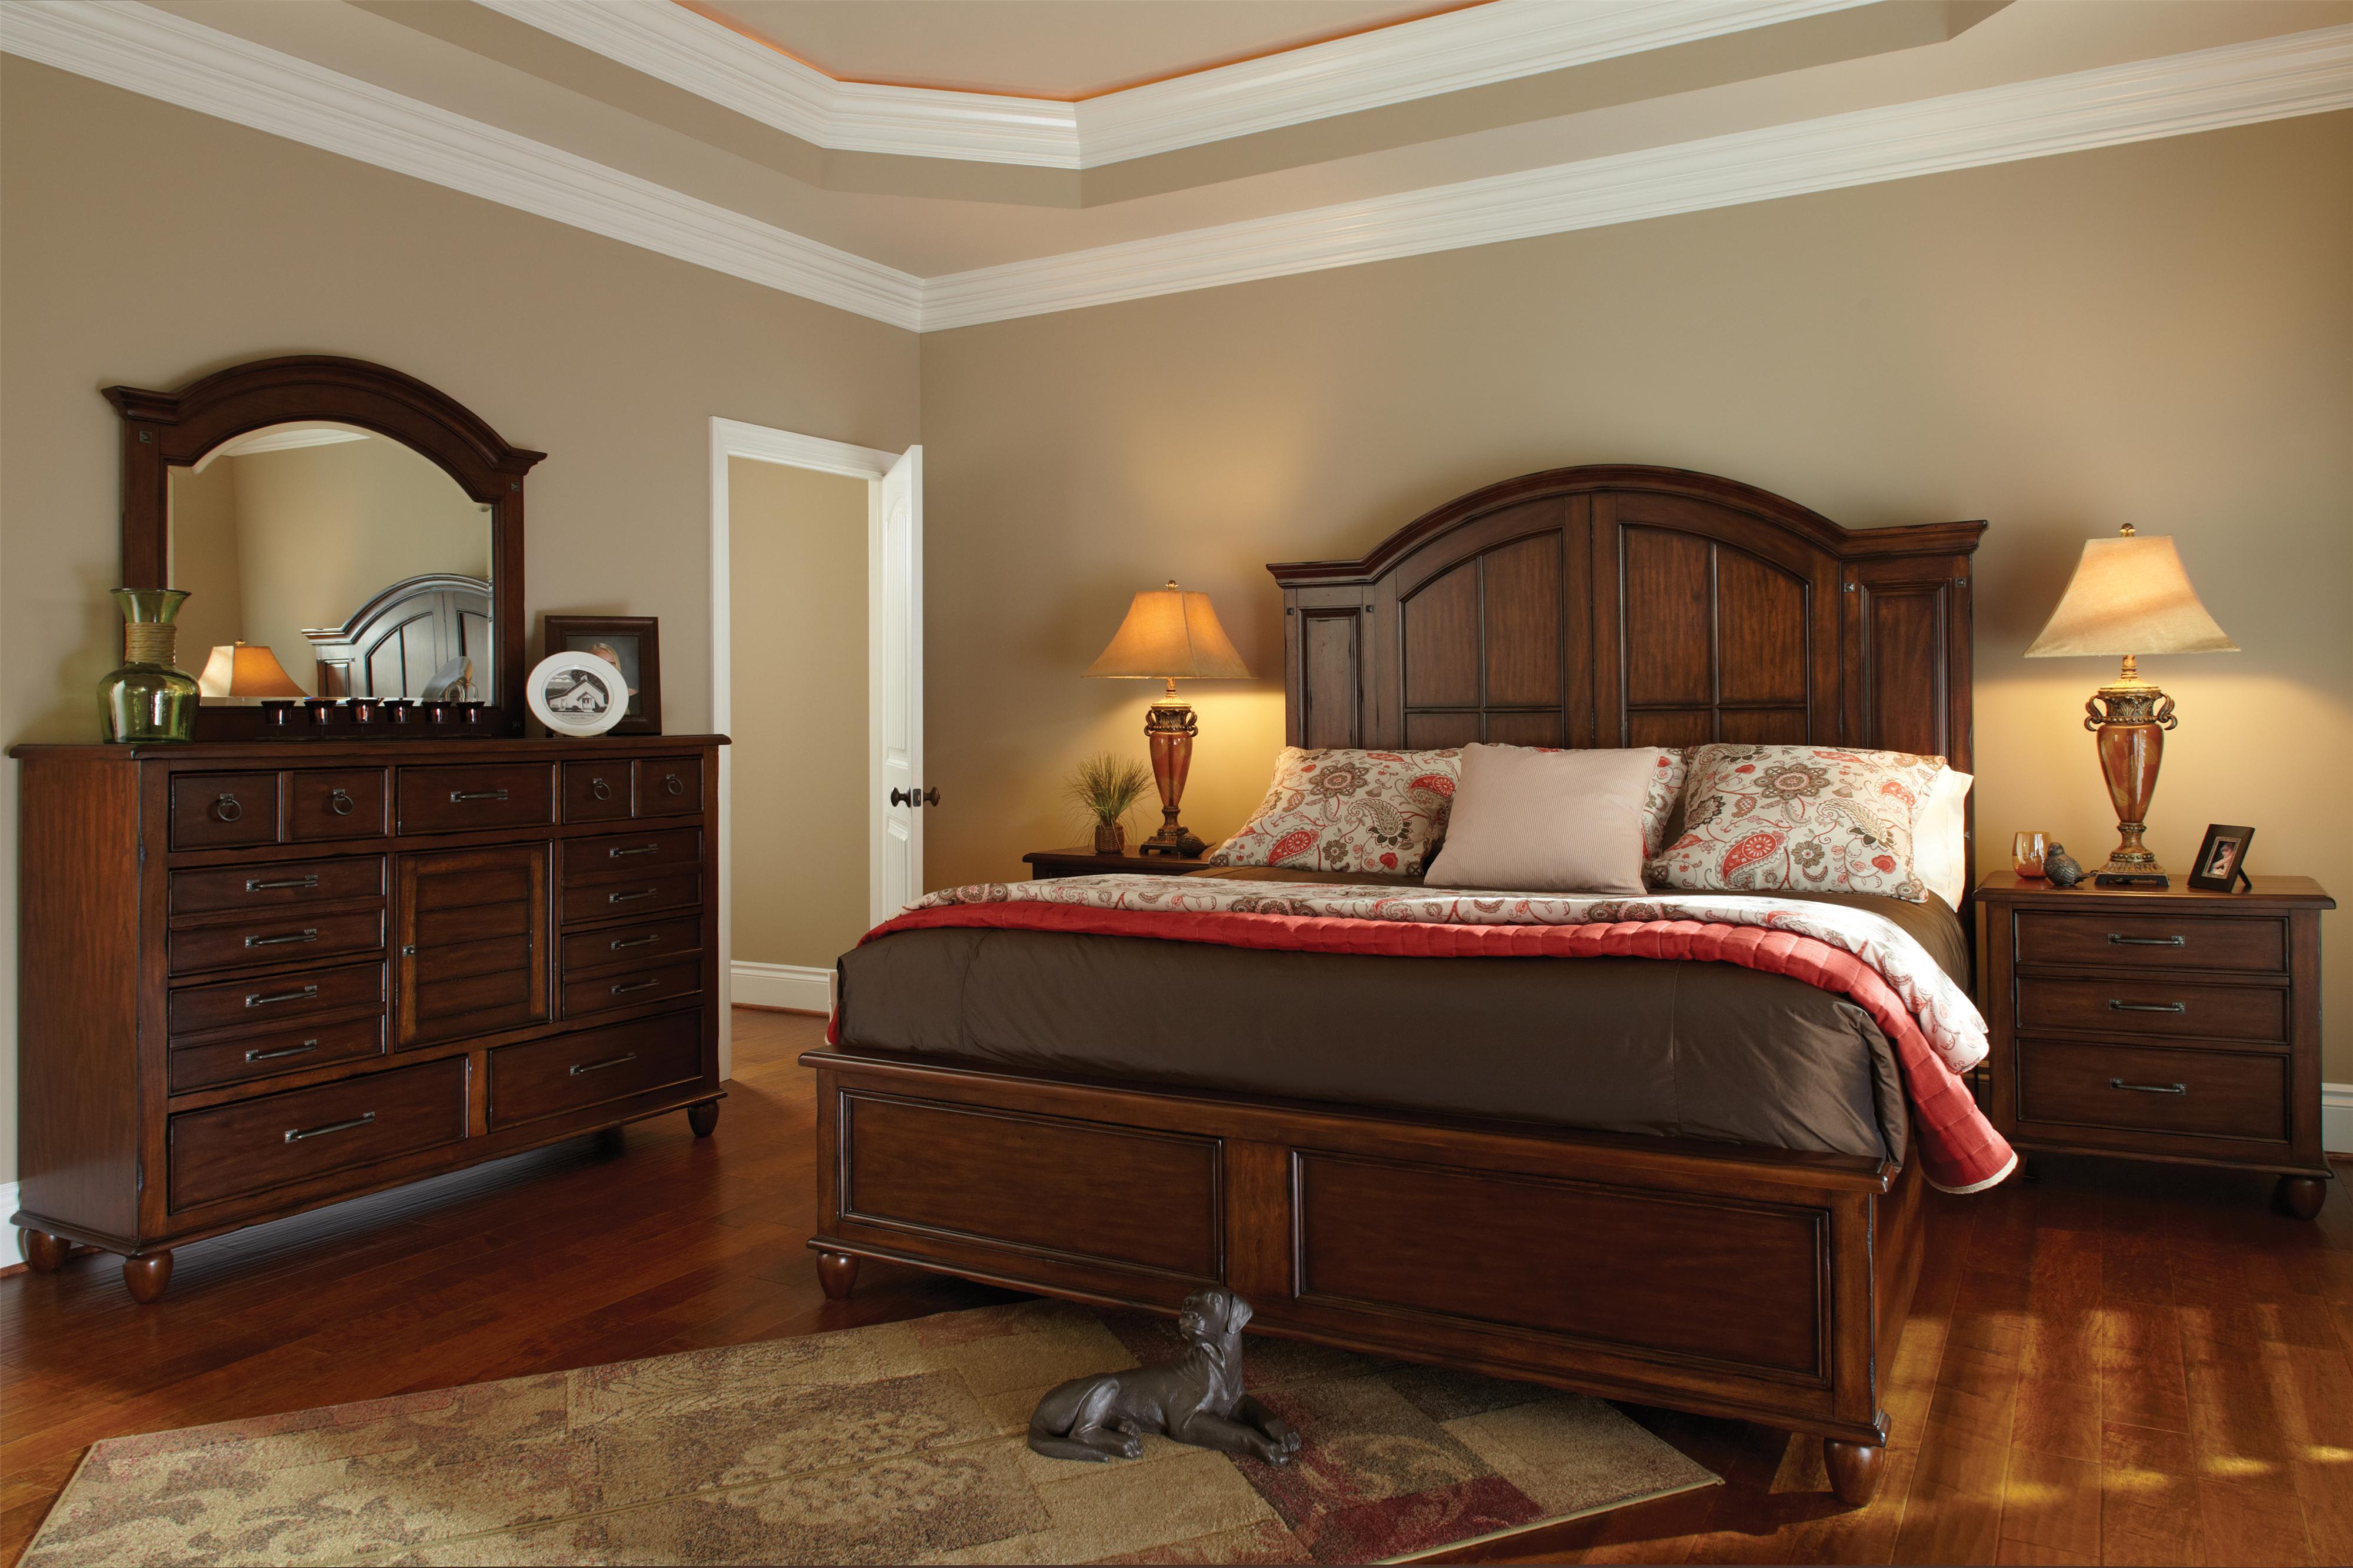 Easton Collection Blue Ridge Queen Bedroom Group - Item Number: 426 Q Bedroom Group 2